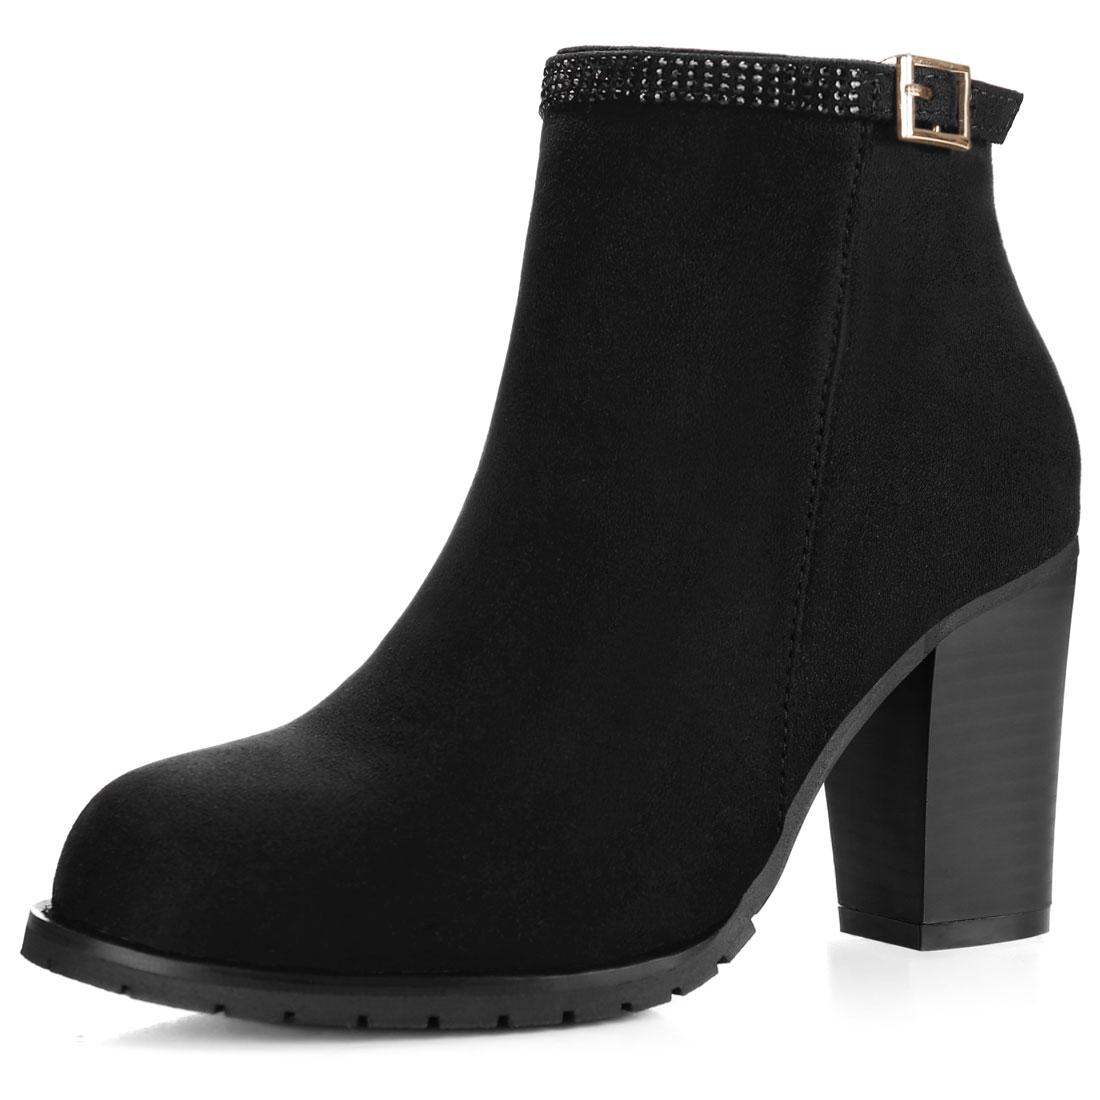 Women Rhinestone Strap Chunky High Heel Ankle Booties Black US 9